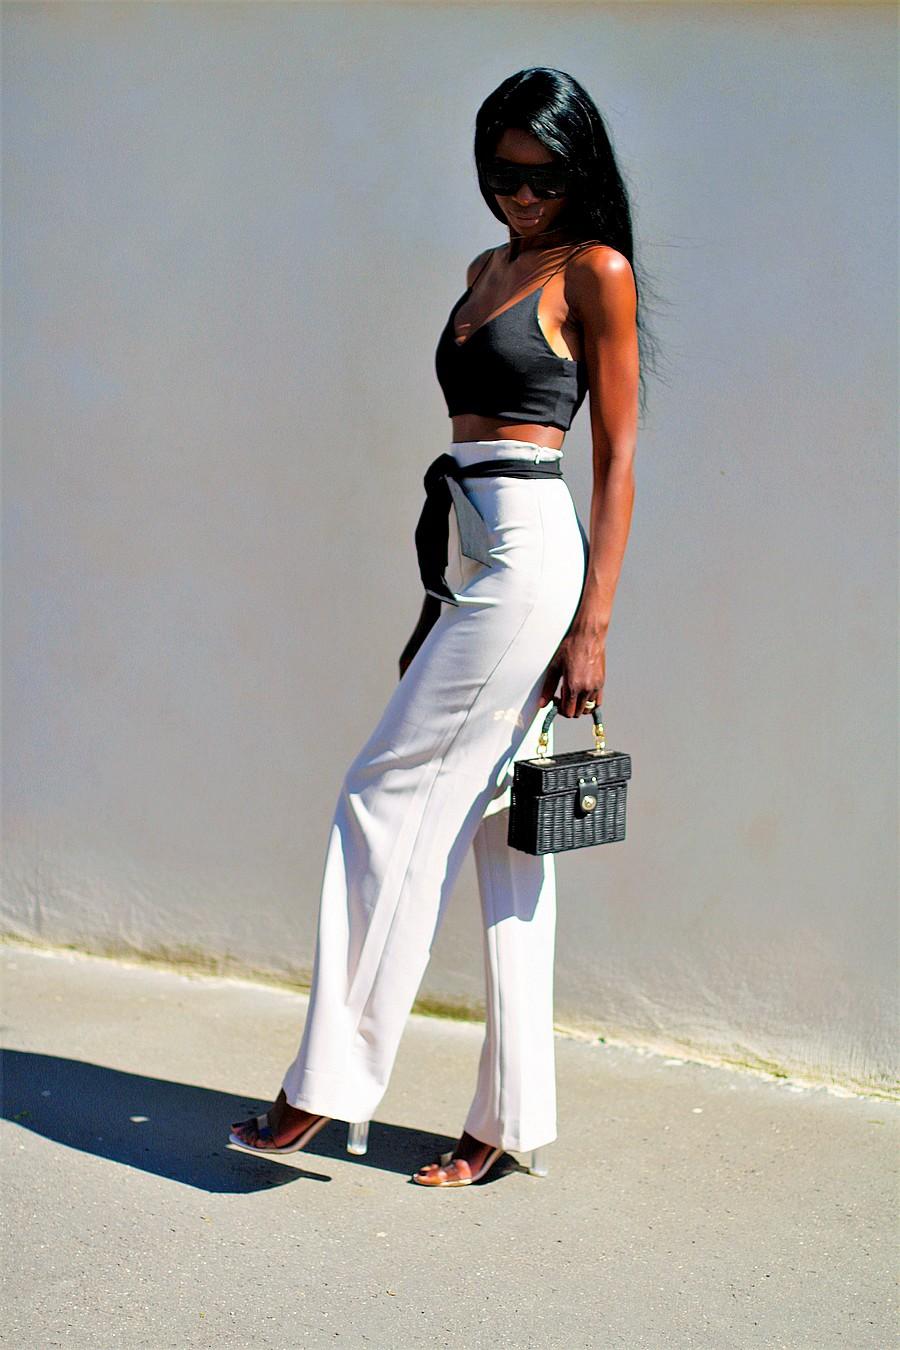 idee-tenue-chic-tendance-pantalon-large-sac-paille-brassiere-crop-top